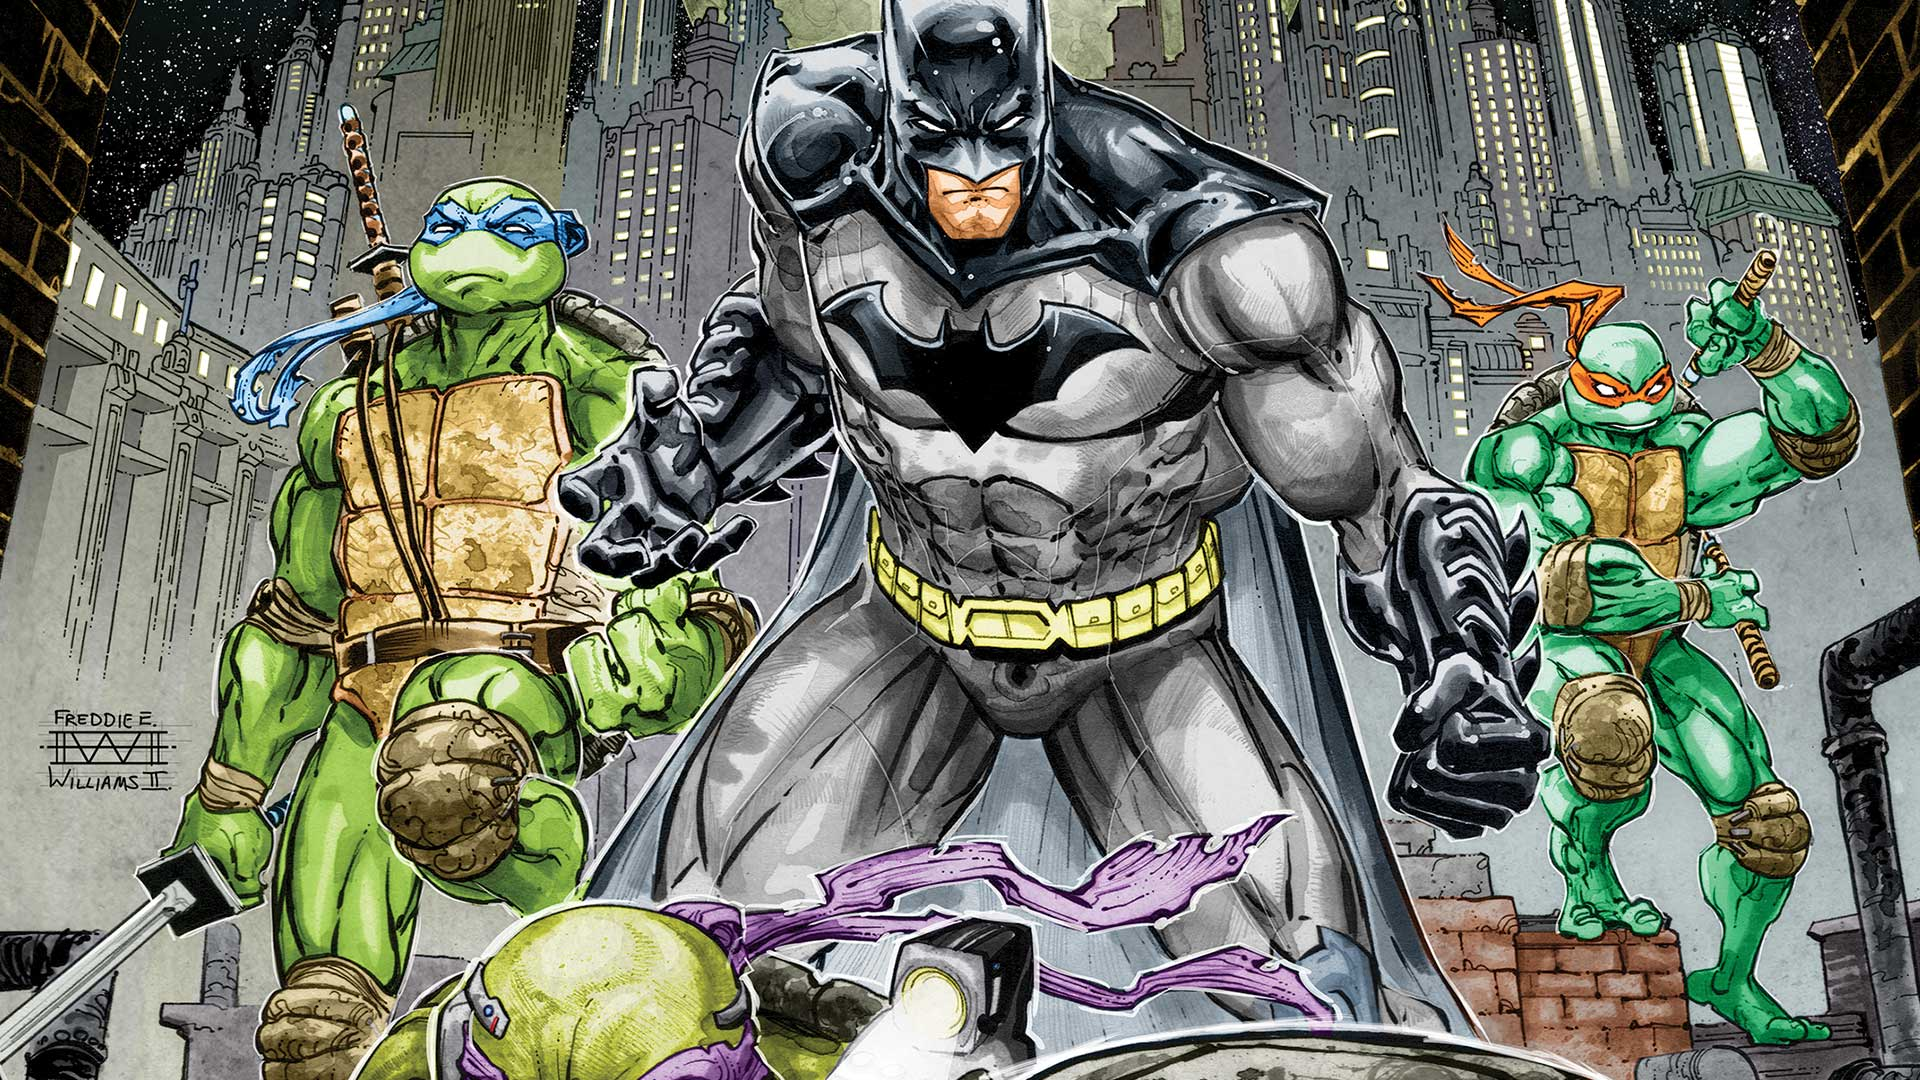 Four-Color Bullet: Secret Wars #9, Batman/Teenage Mutant Ninja Turtles #2